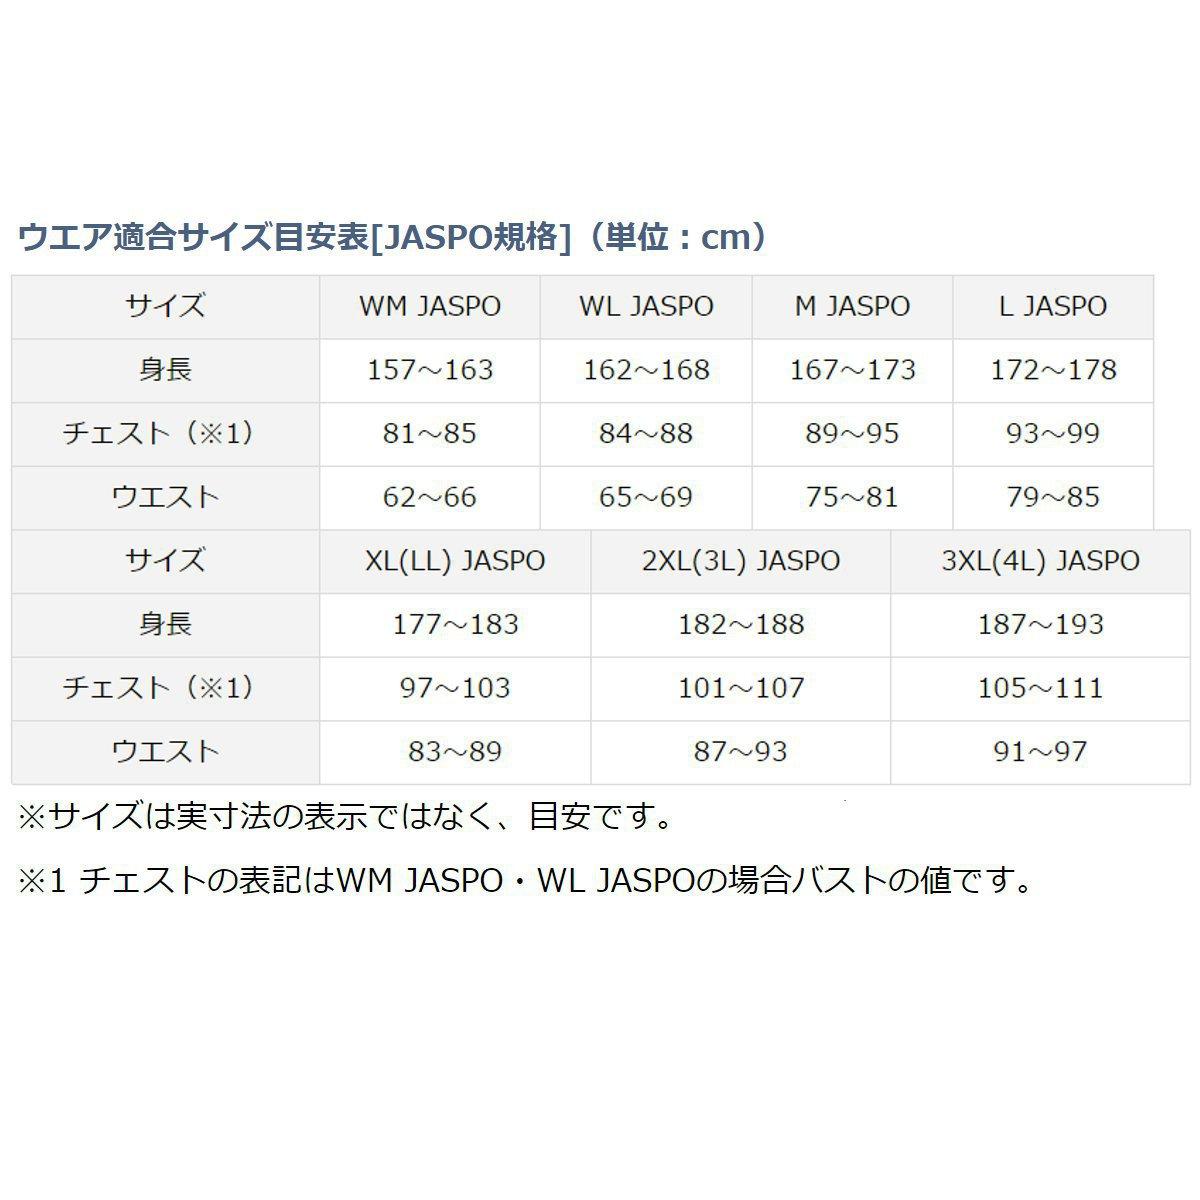 Daiwa (Daiwa) horizontal stripe short sleeve shirt DE-8507 XL black X duck